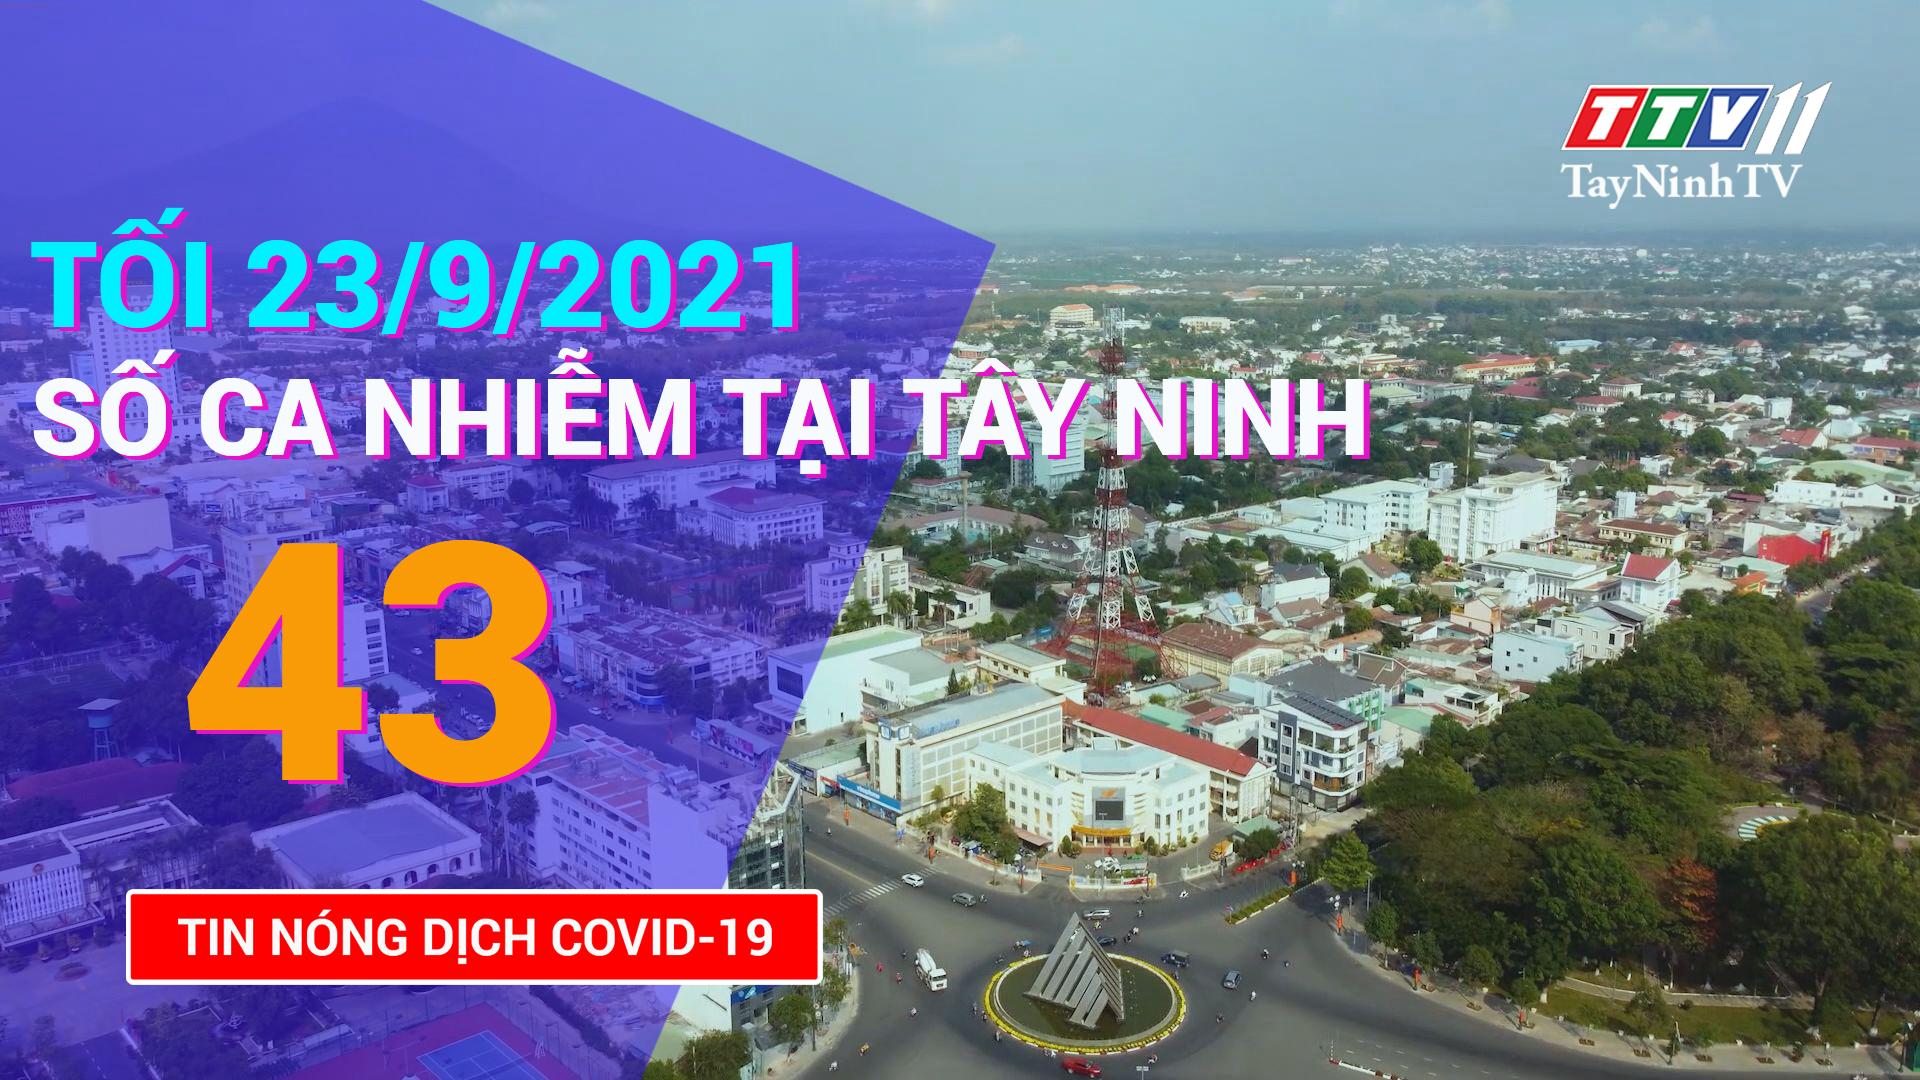 Tin tức Covid-19 tối 23/9/2021 | TayNinhTV